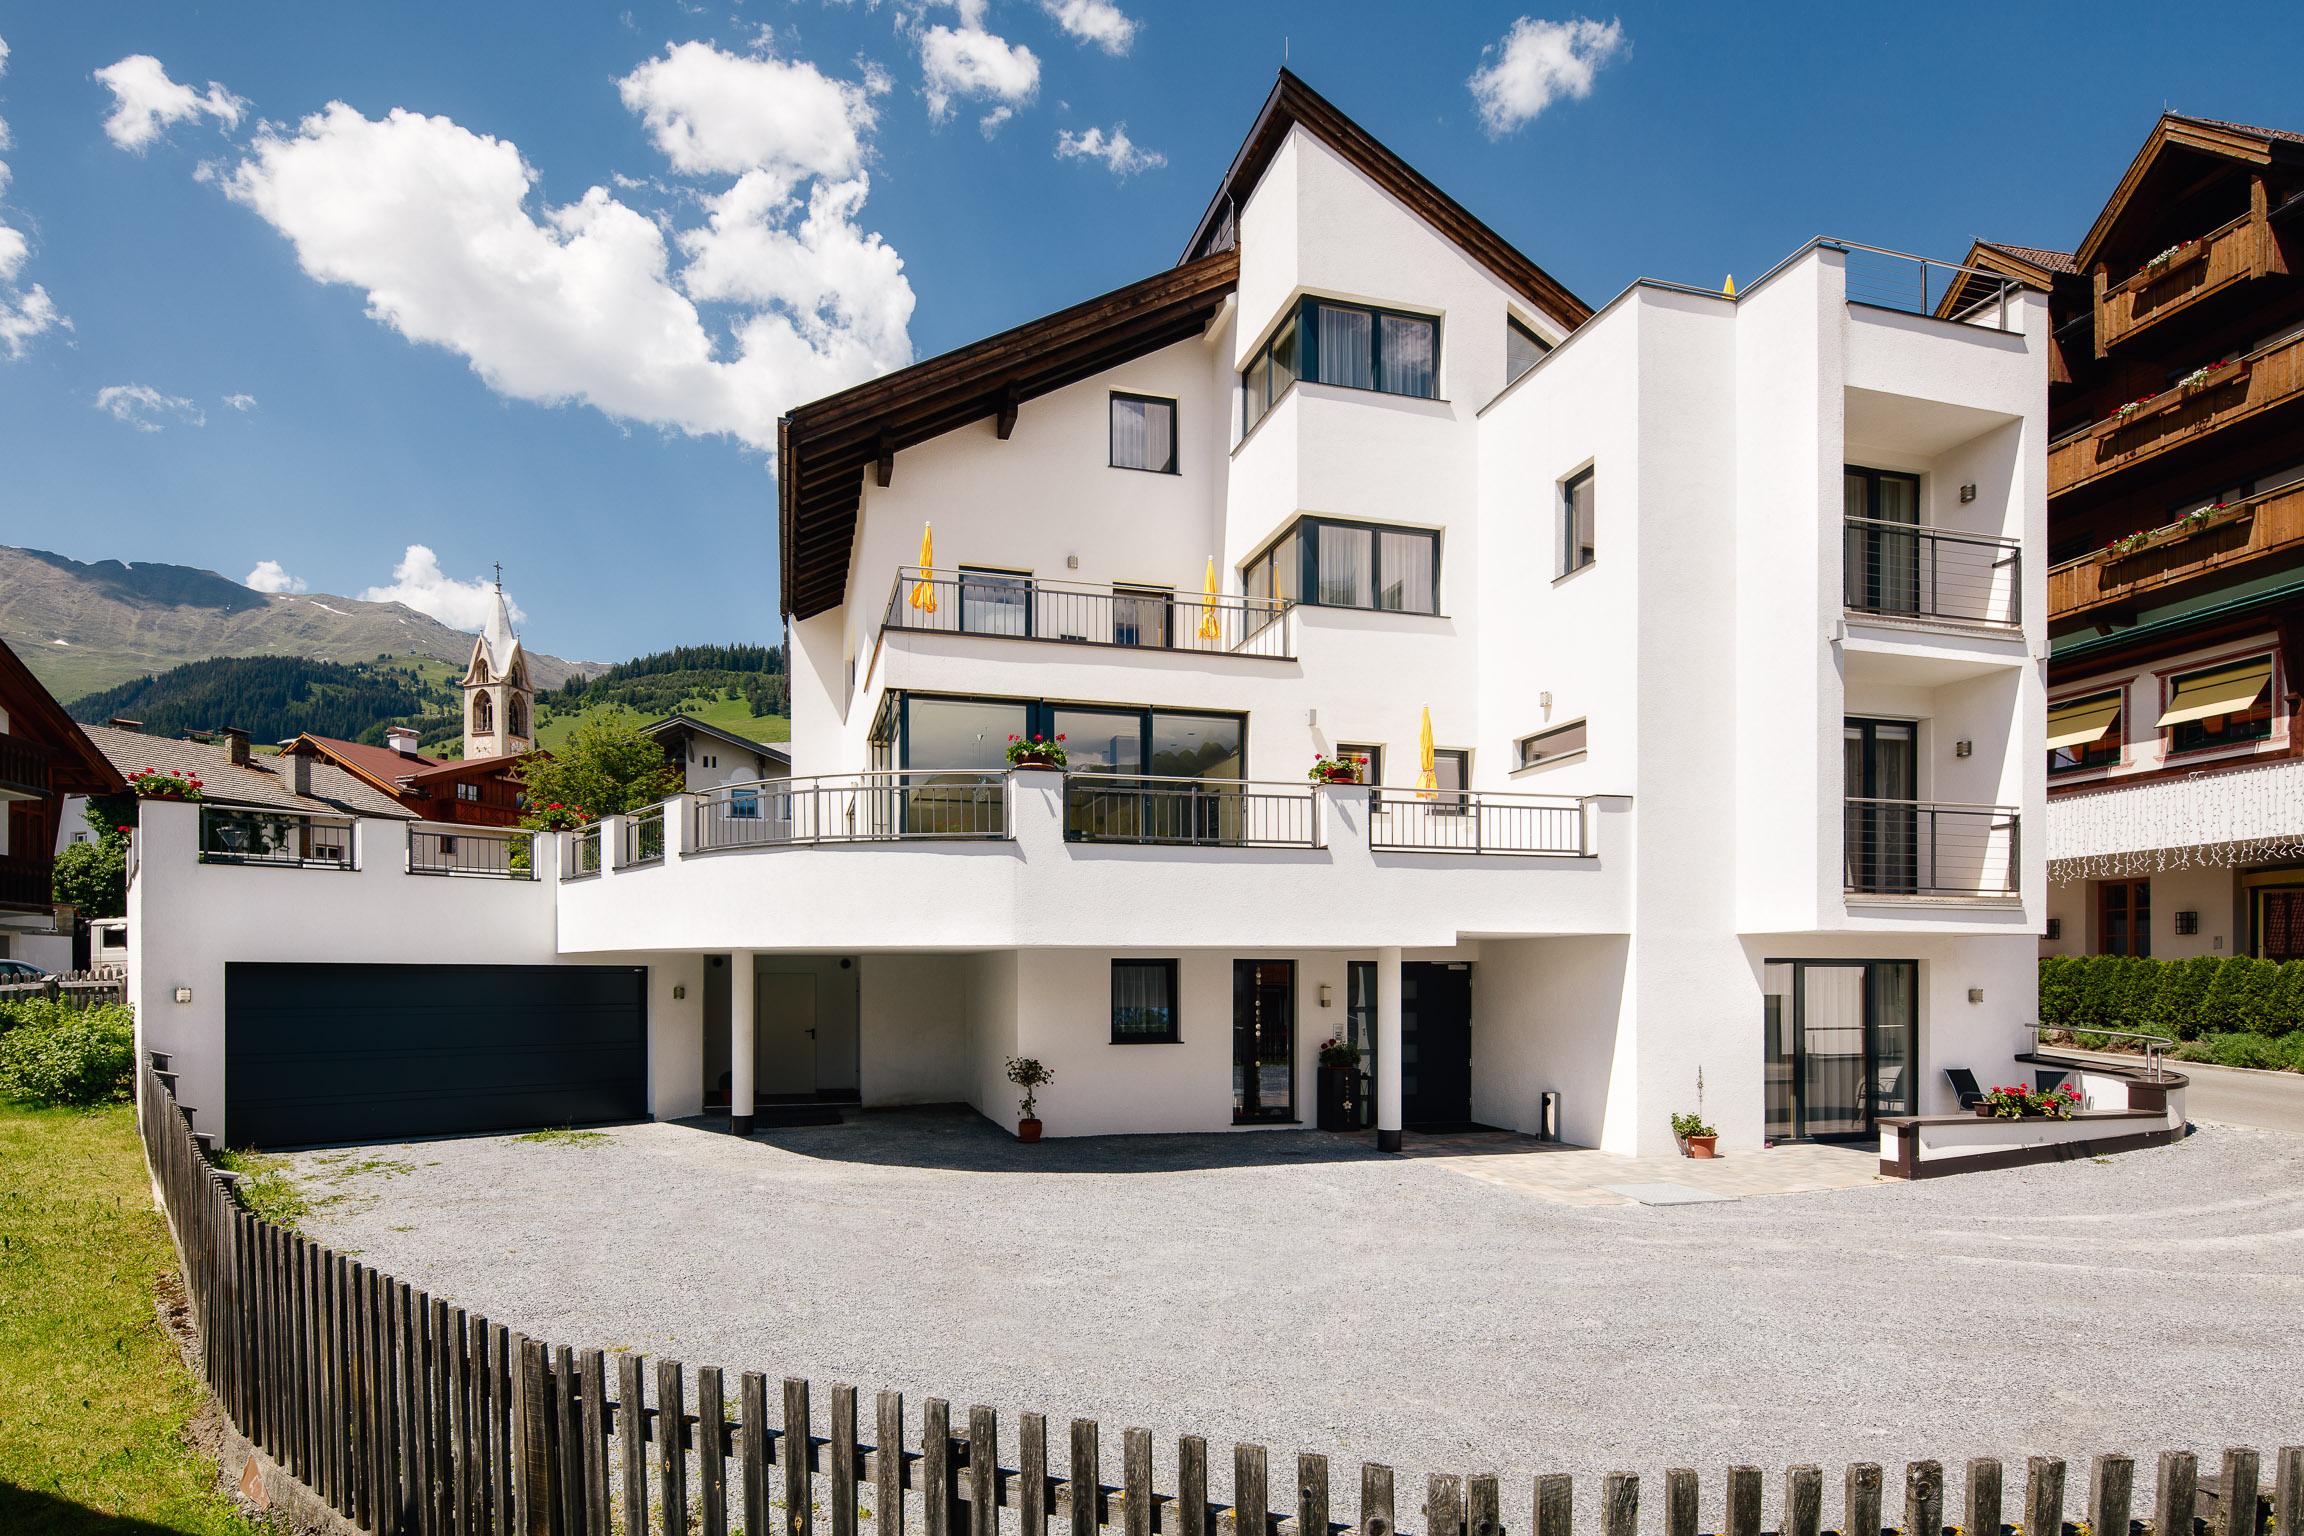 Apartments S-Platzl Haus